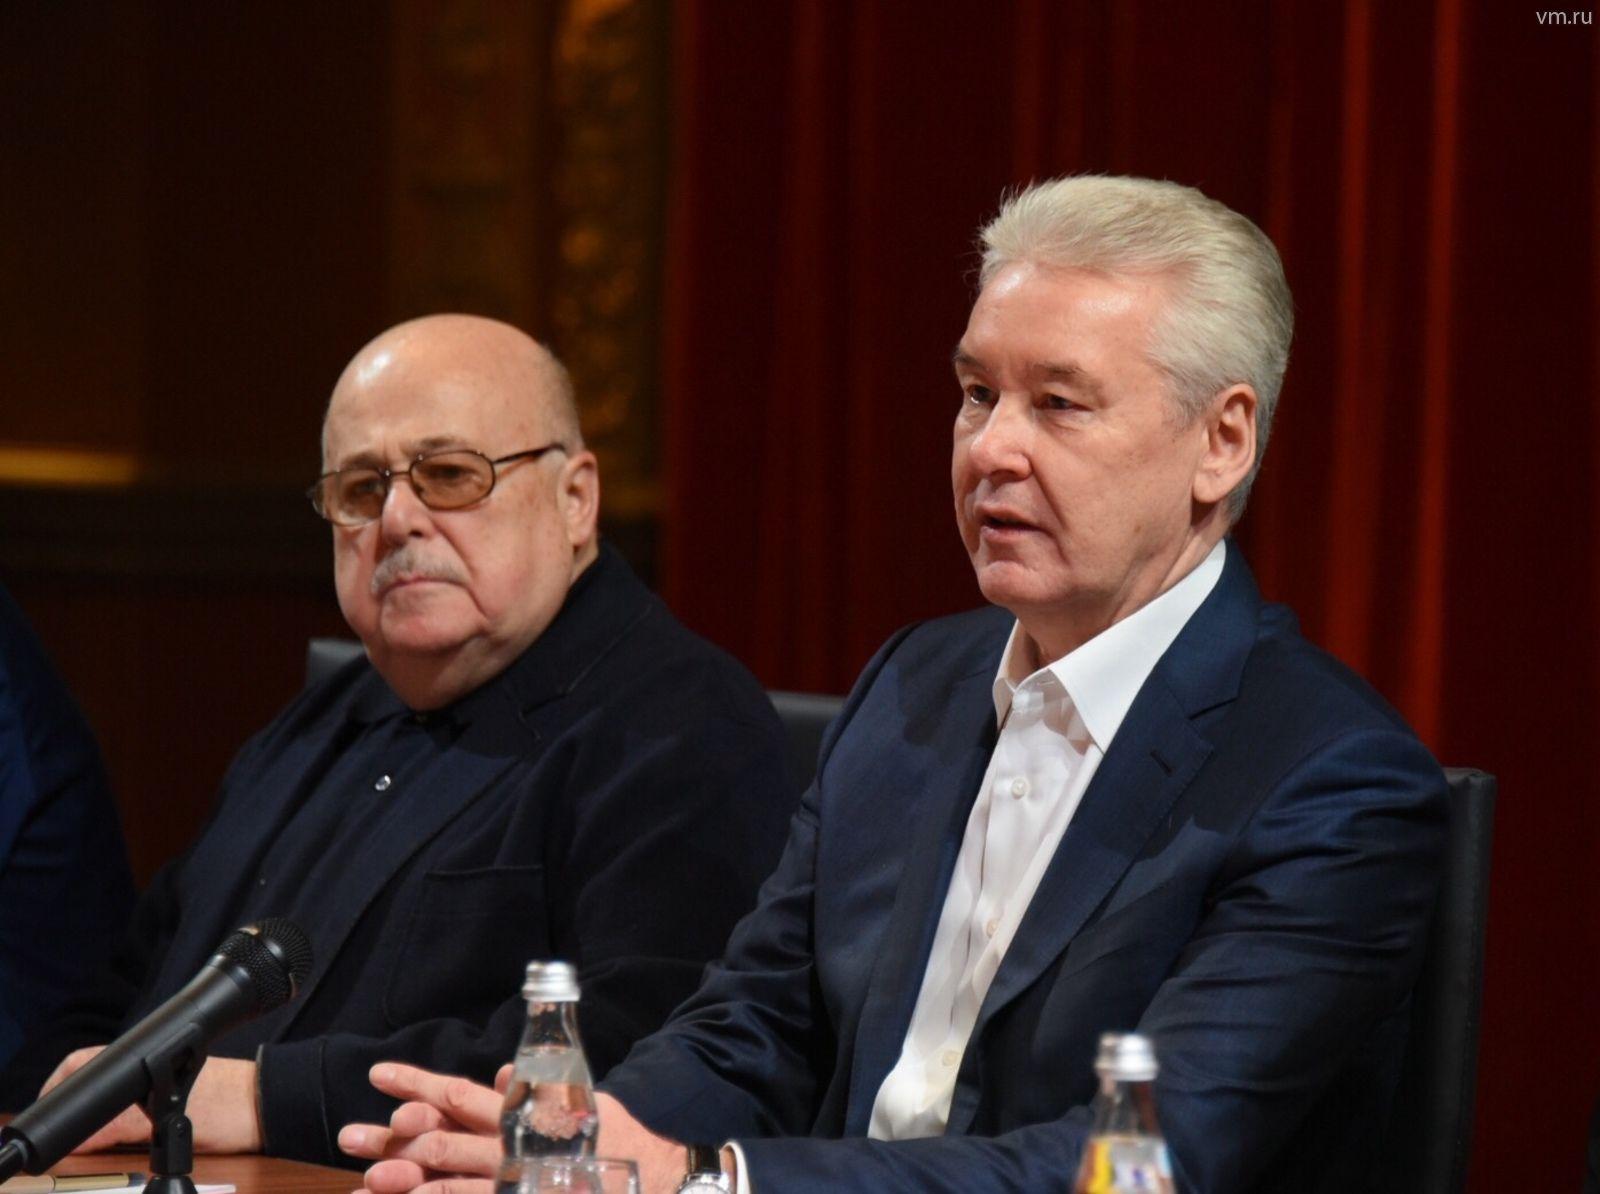 Сергей Собянин поздравил Александра Калягина с 77-летием